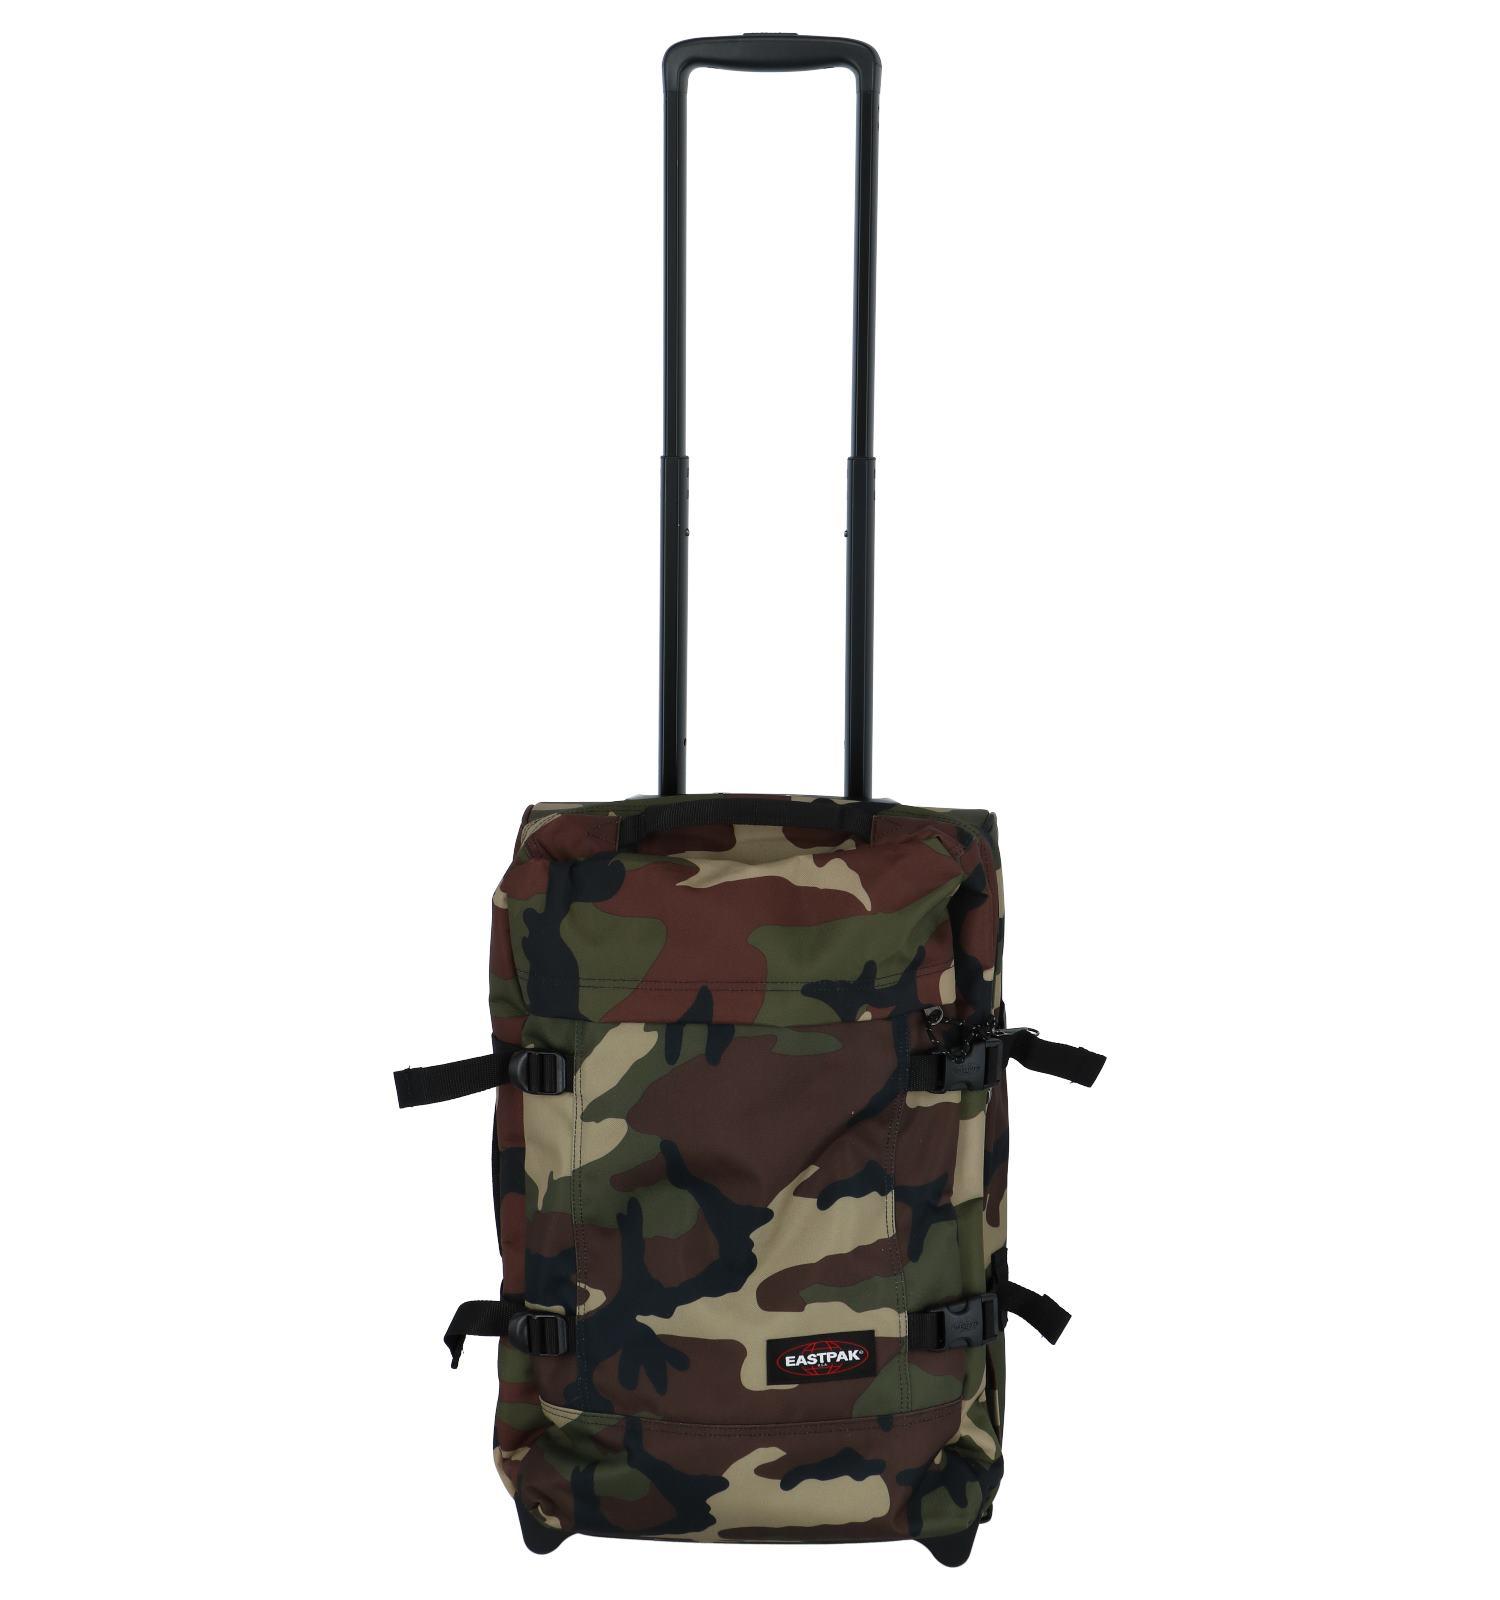 Trolley Camouflageprint Eastpak Met Ek61l Tranverz S tQBhCxsrd